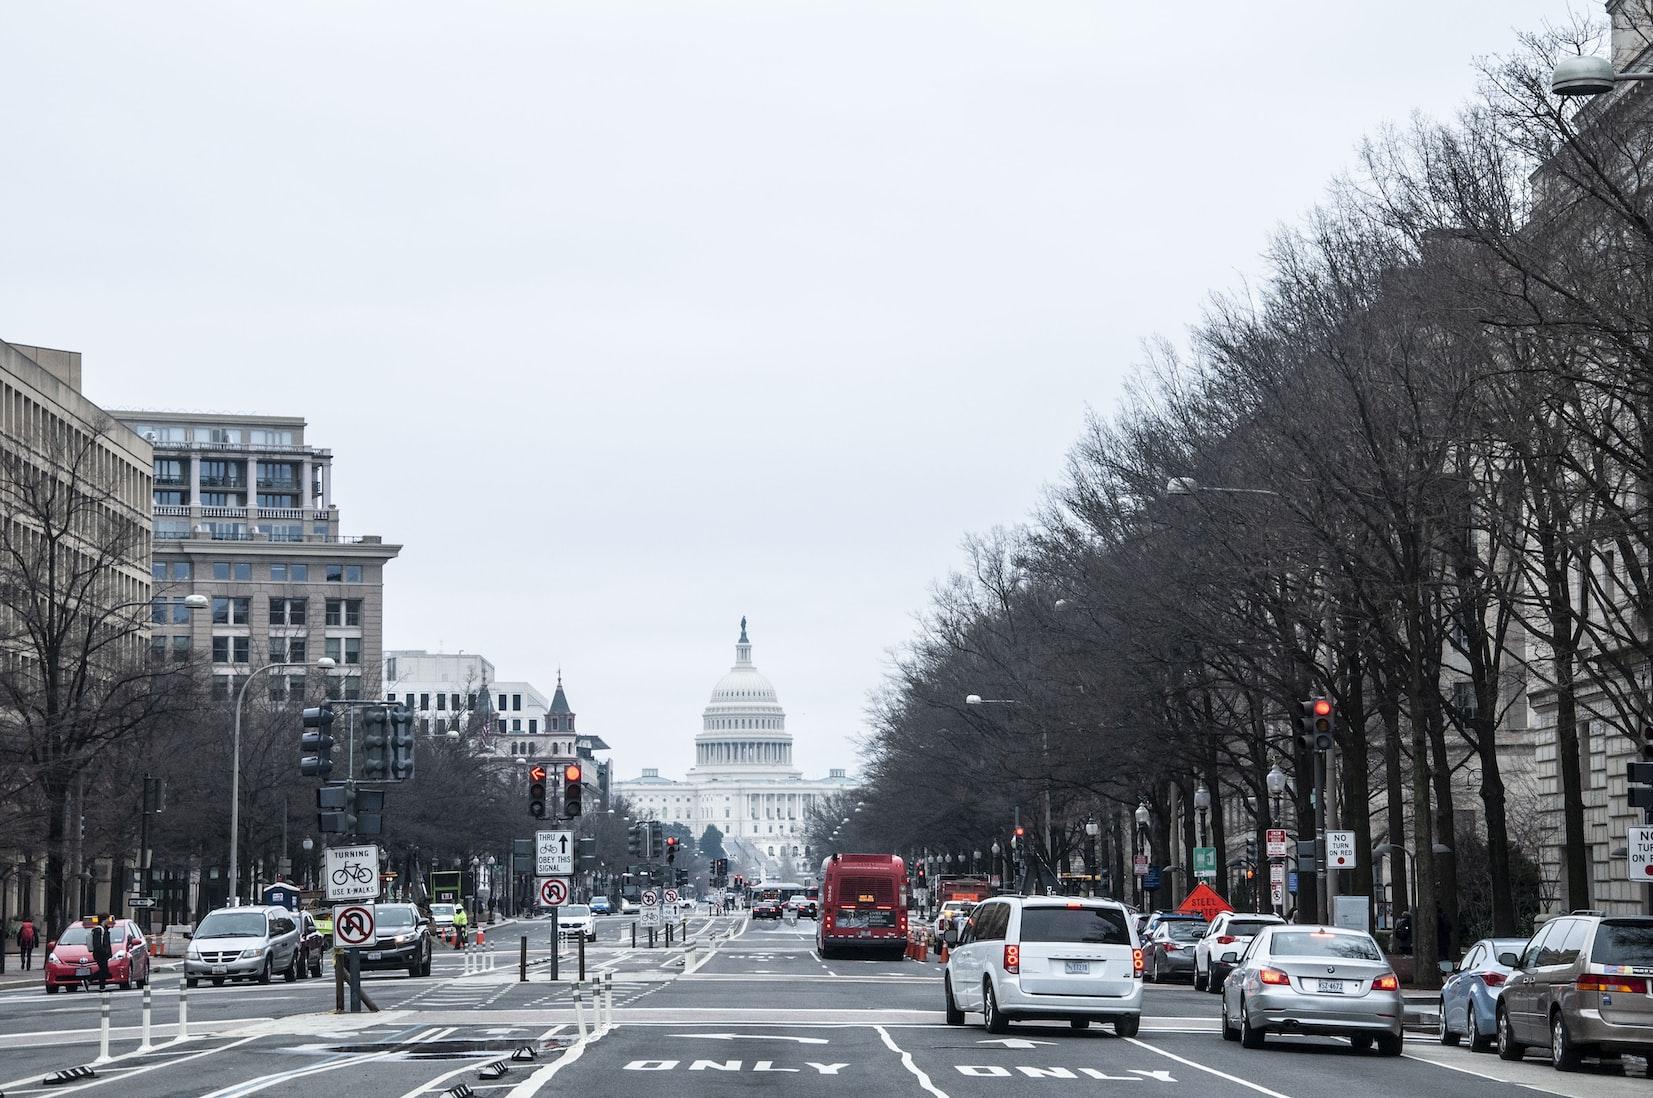 Busy street in Washington D.C.